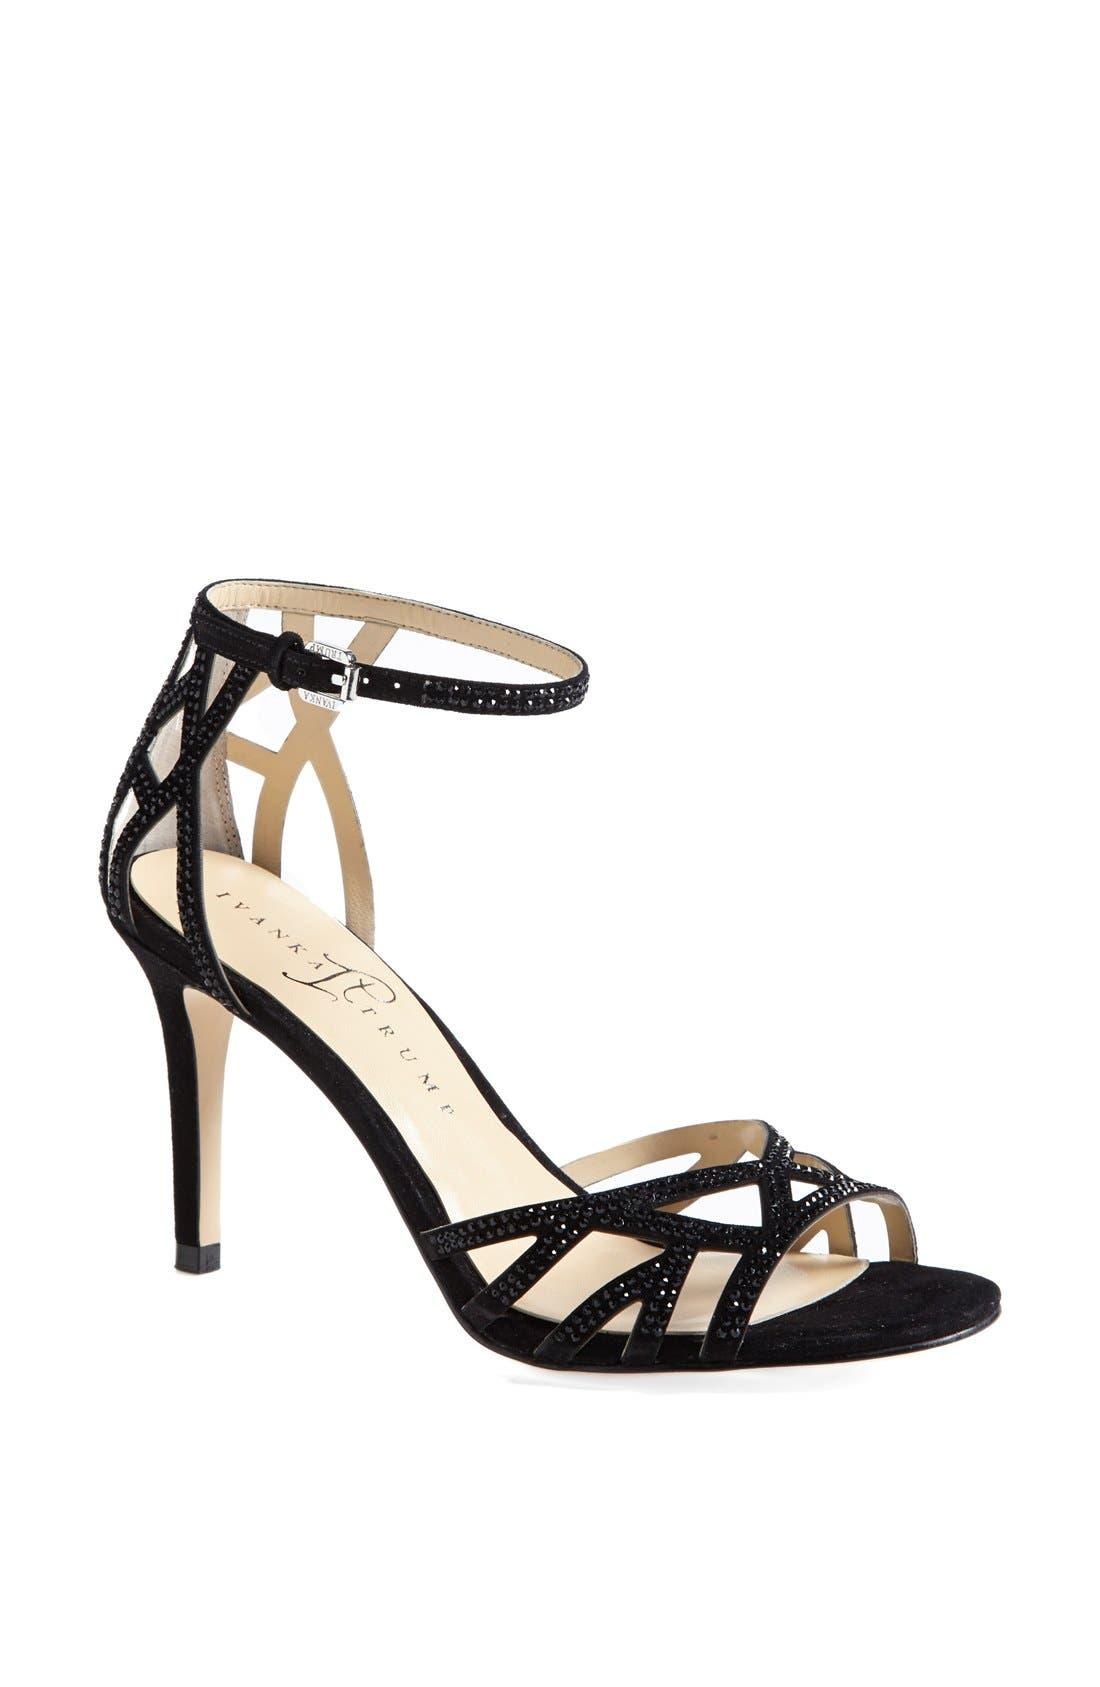 IVANKA TRUMP 'Gifford' Crystal Embellished Sandal, Main, color, 001